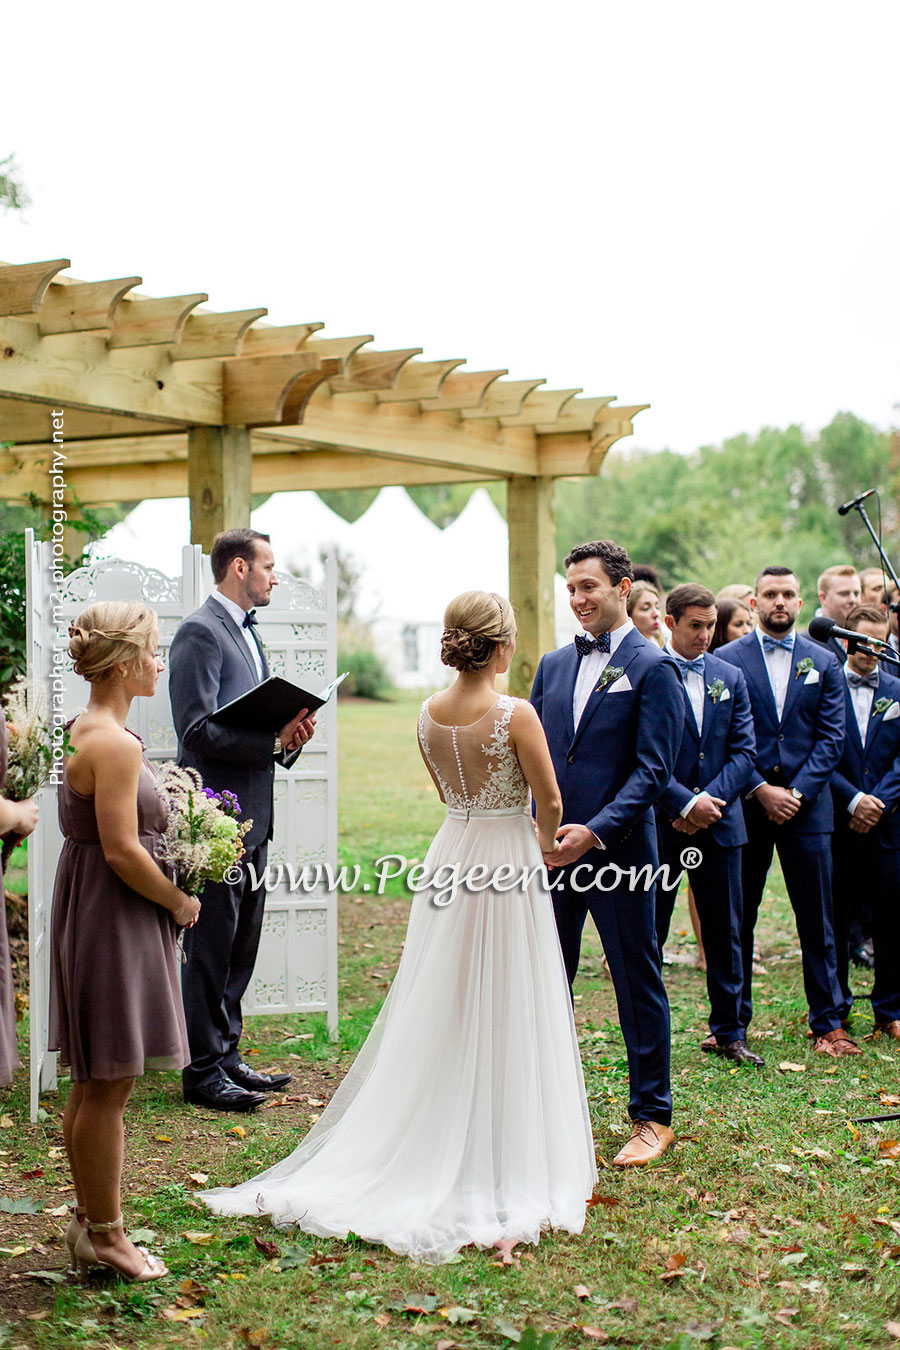 backyard wedding backyard wedding dresses Back Yard Wedding Flower Girl Dress of the Year in silk and tulle